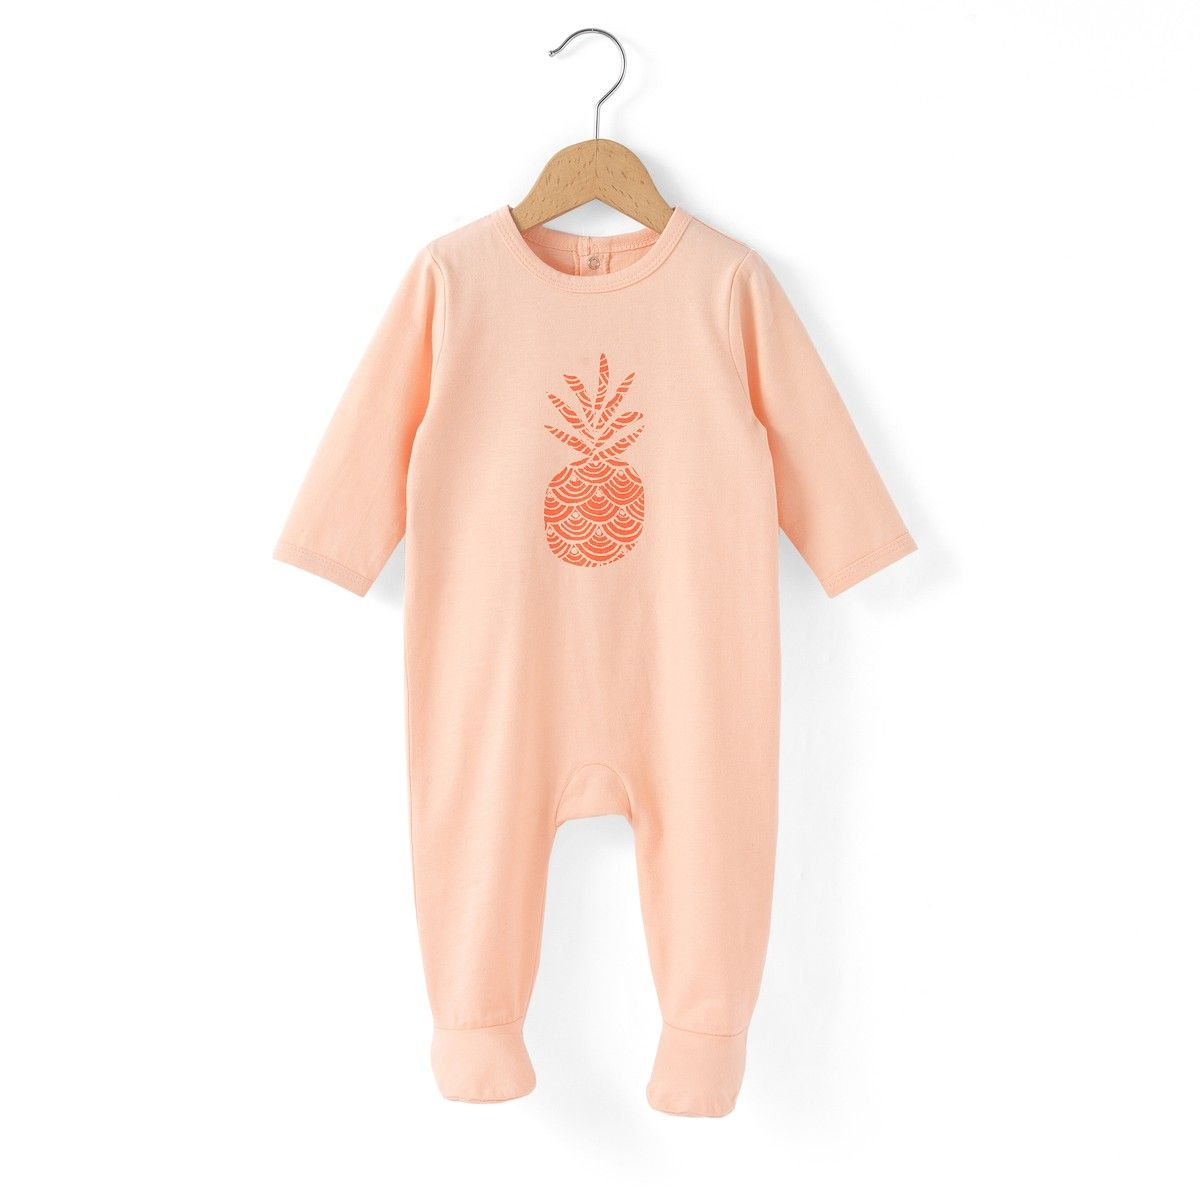 2ae90e1ea95d8 Pyjama coton imprimé ananas 0 mois-3 ans R Édition corail